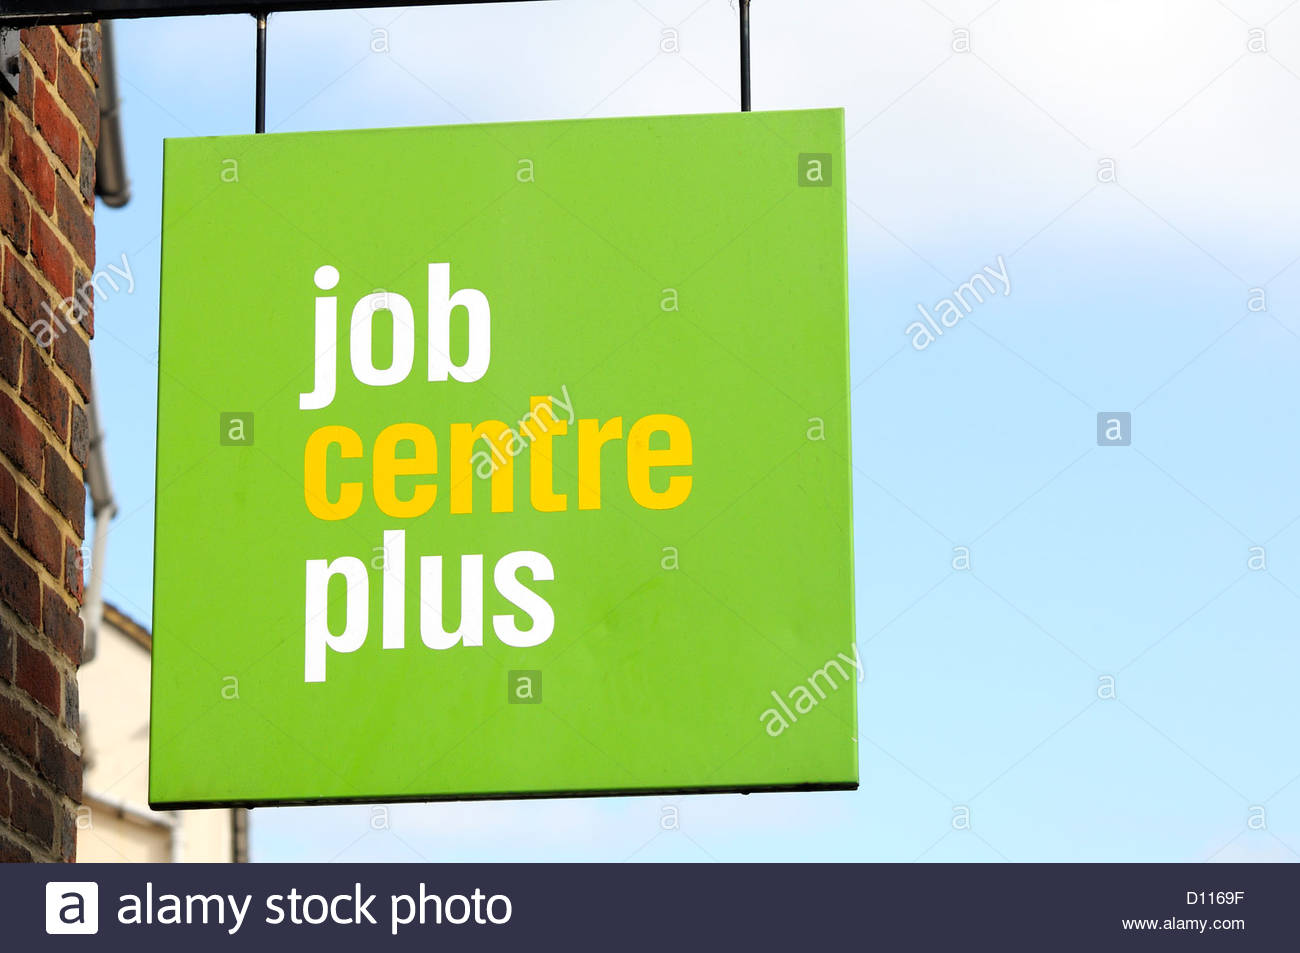 Job Centre Plus sign, Blandford Forum, Dorset England Stock Photo